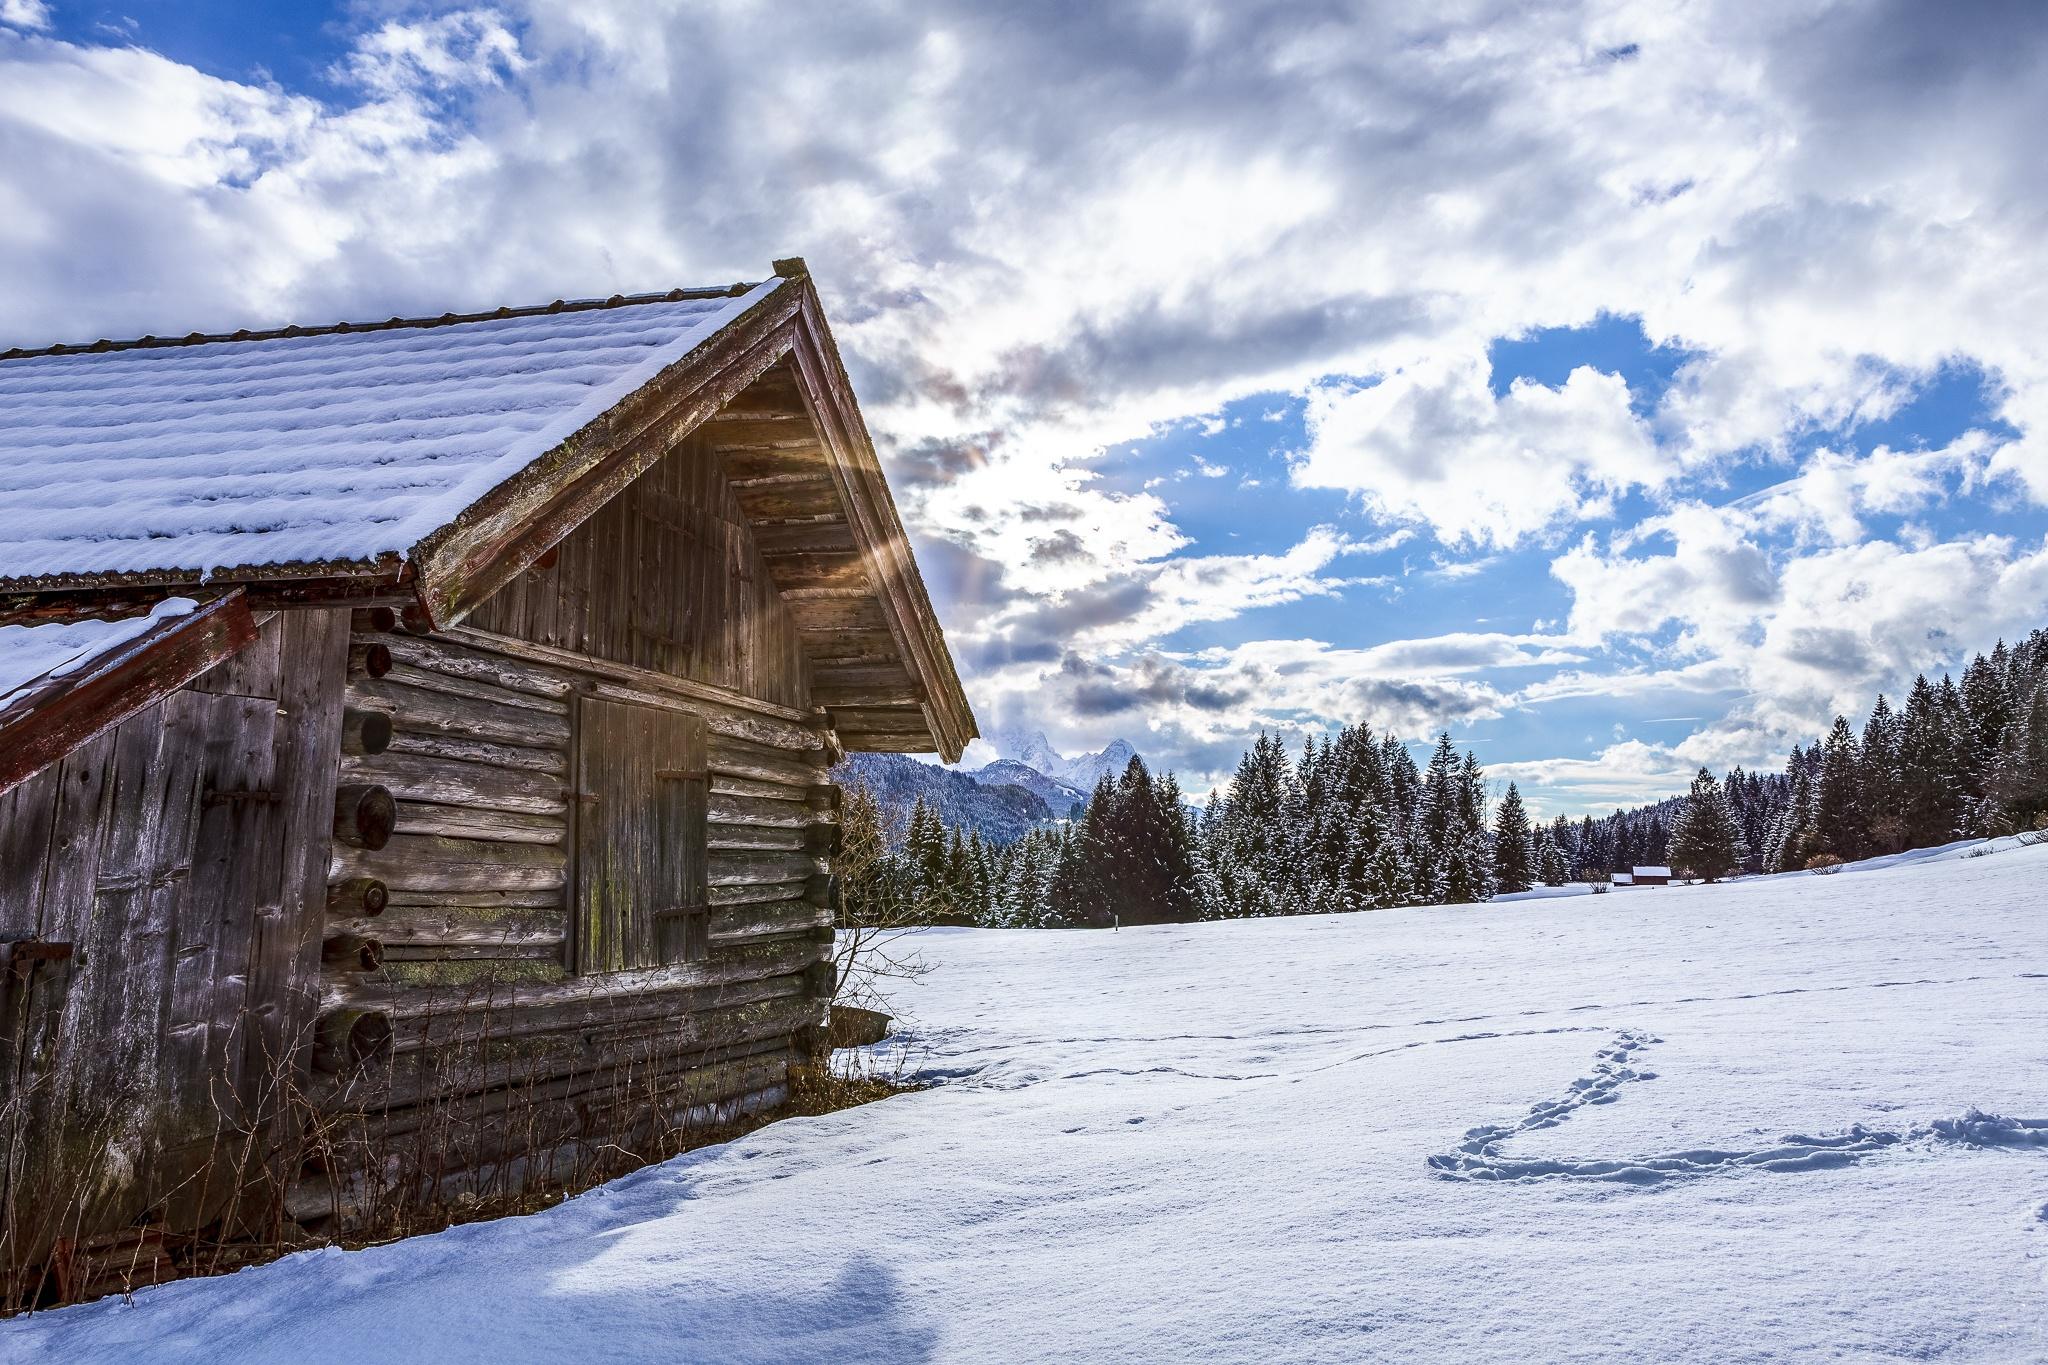 Stadel in Gerold - Winterbild